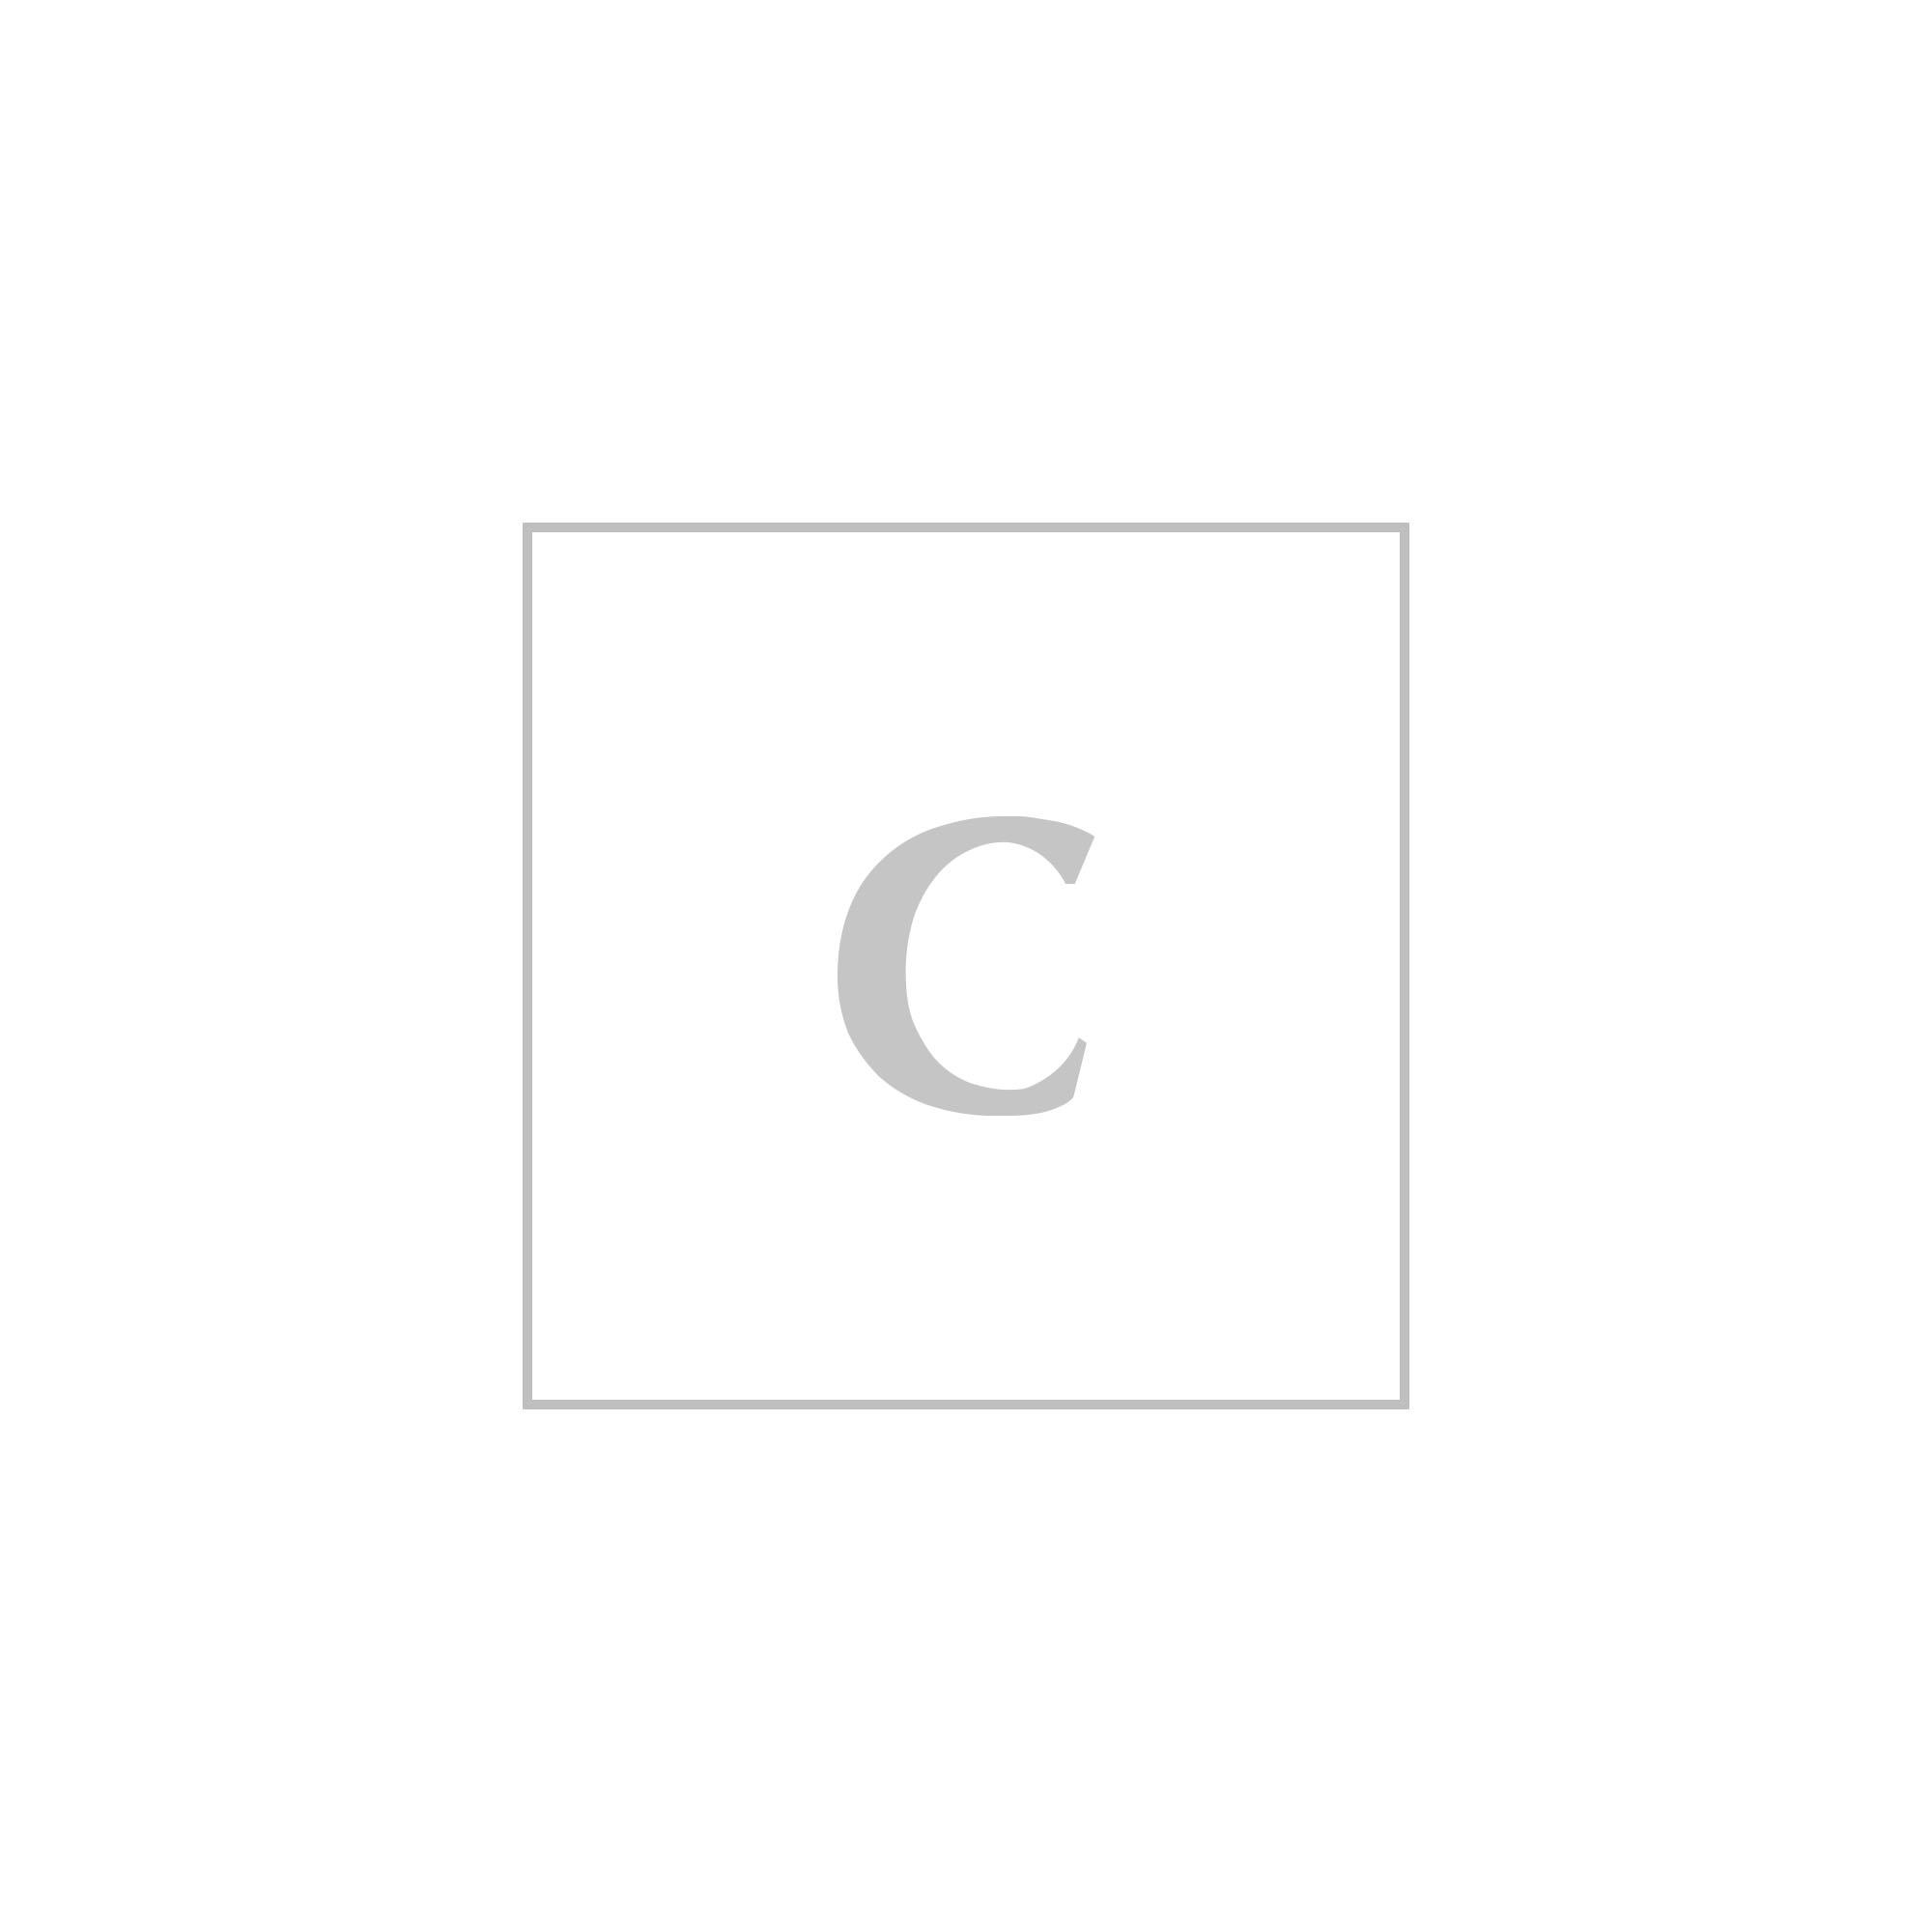 Dolce & gabbana borsa sicily small stampa dauphine